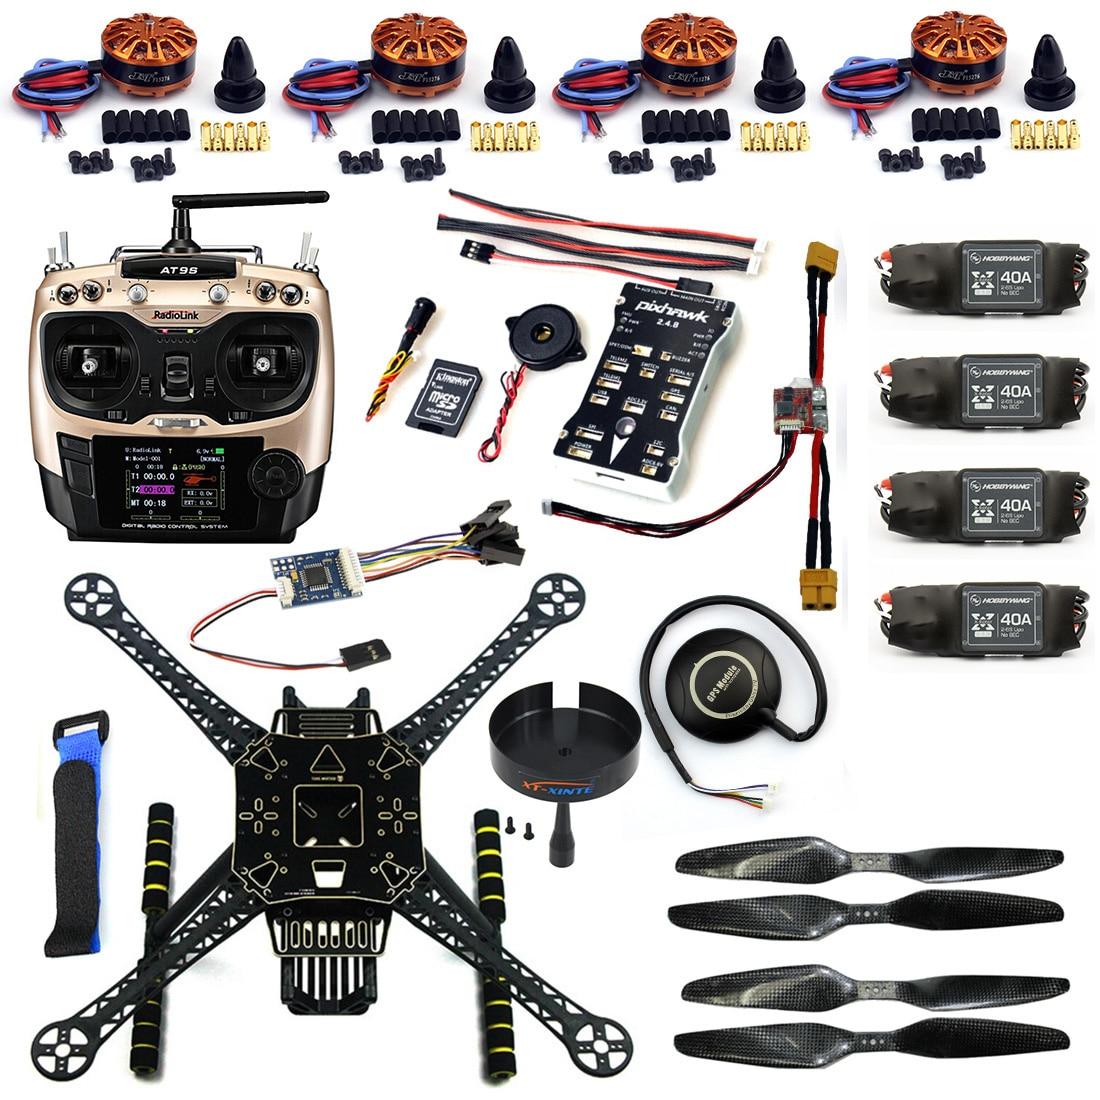 F19457-B DIY FPV Drone Kit S600 4-Axle Frame 40A ESC with 700KV Motor Pix 2.4.8 Flight Control AT9S Transimitter GPS XT60 Plug цена 2017